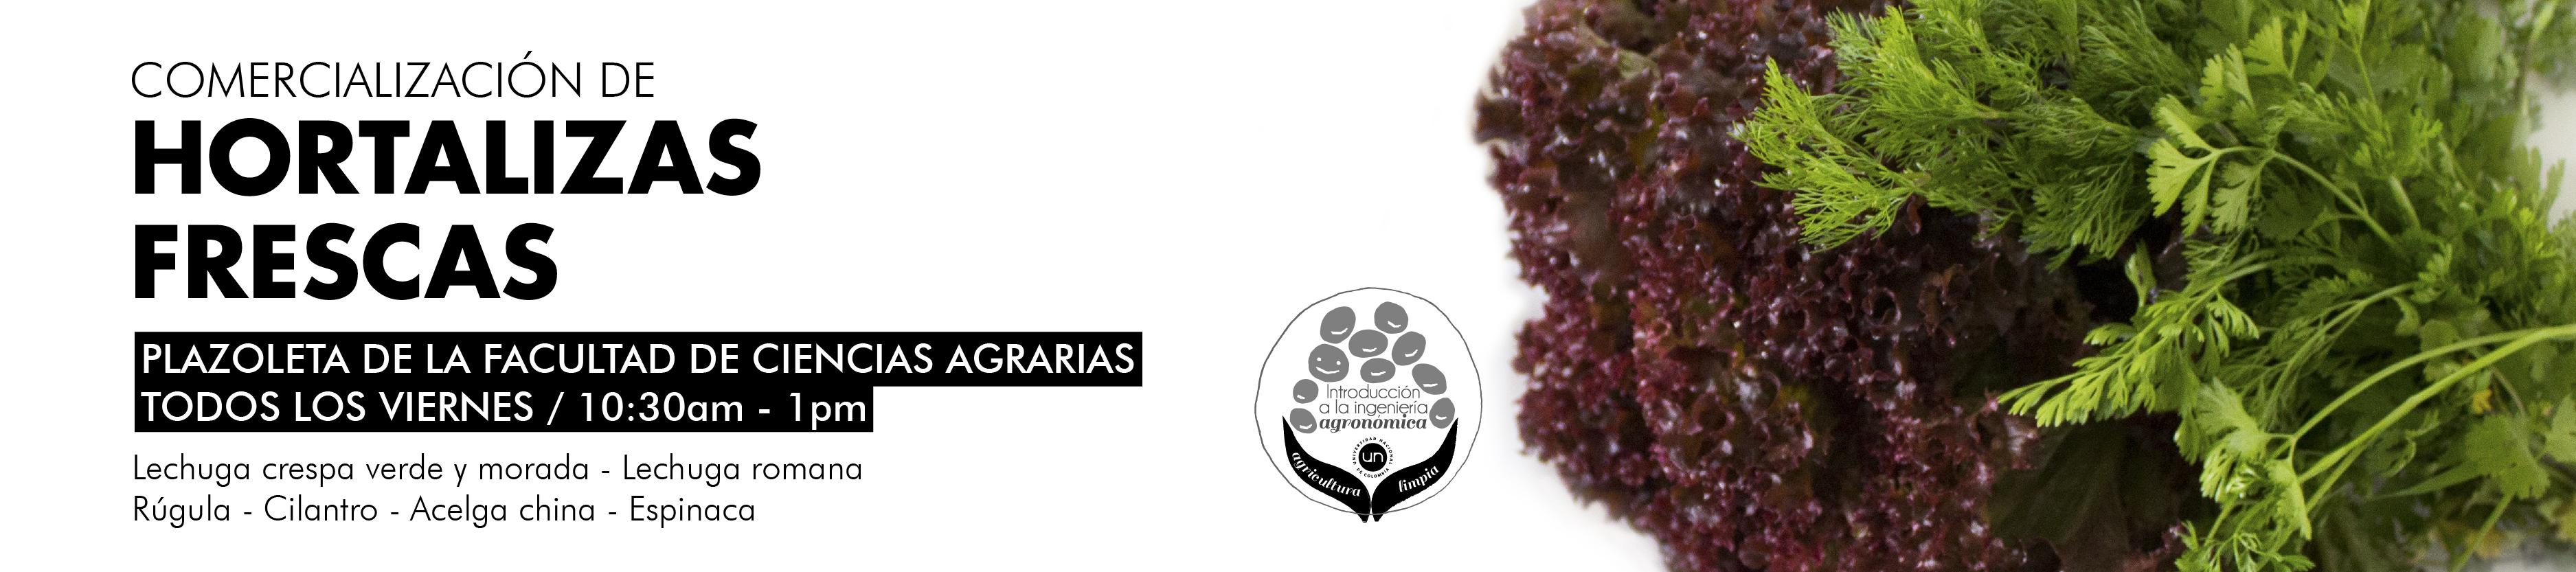 banner hortalizas-01.jpg